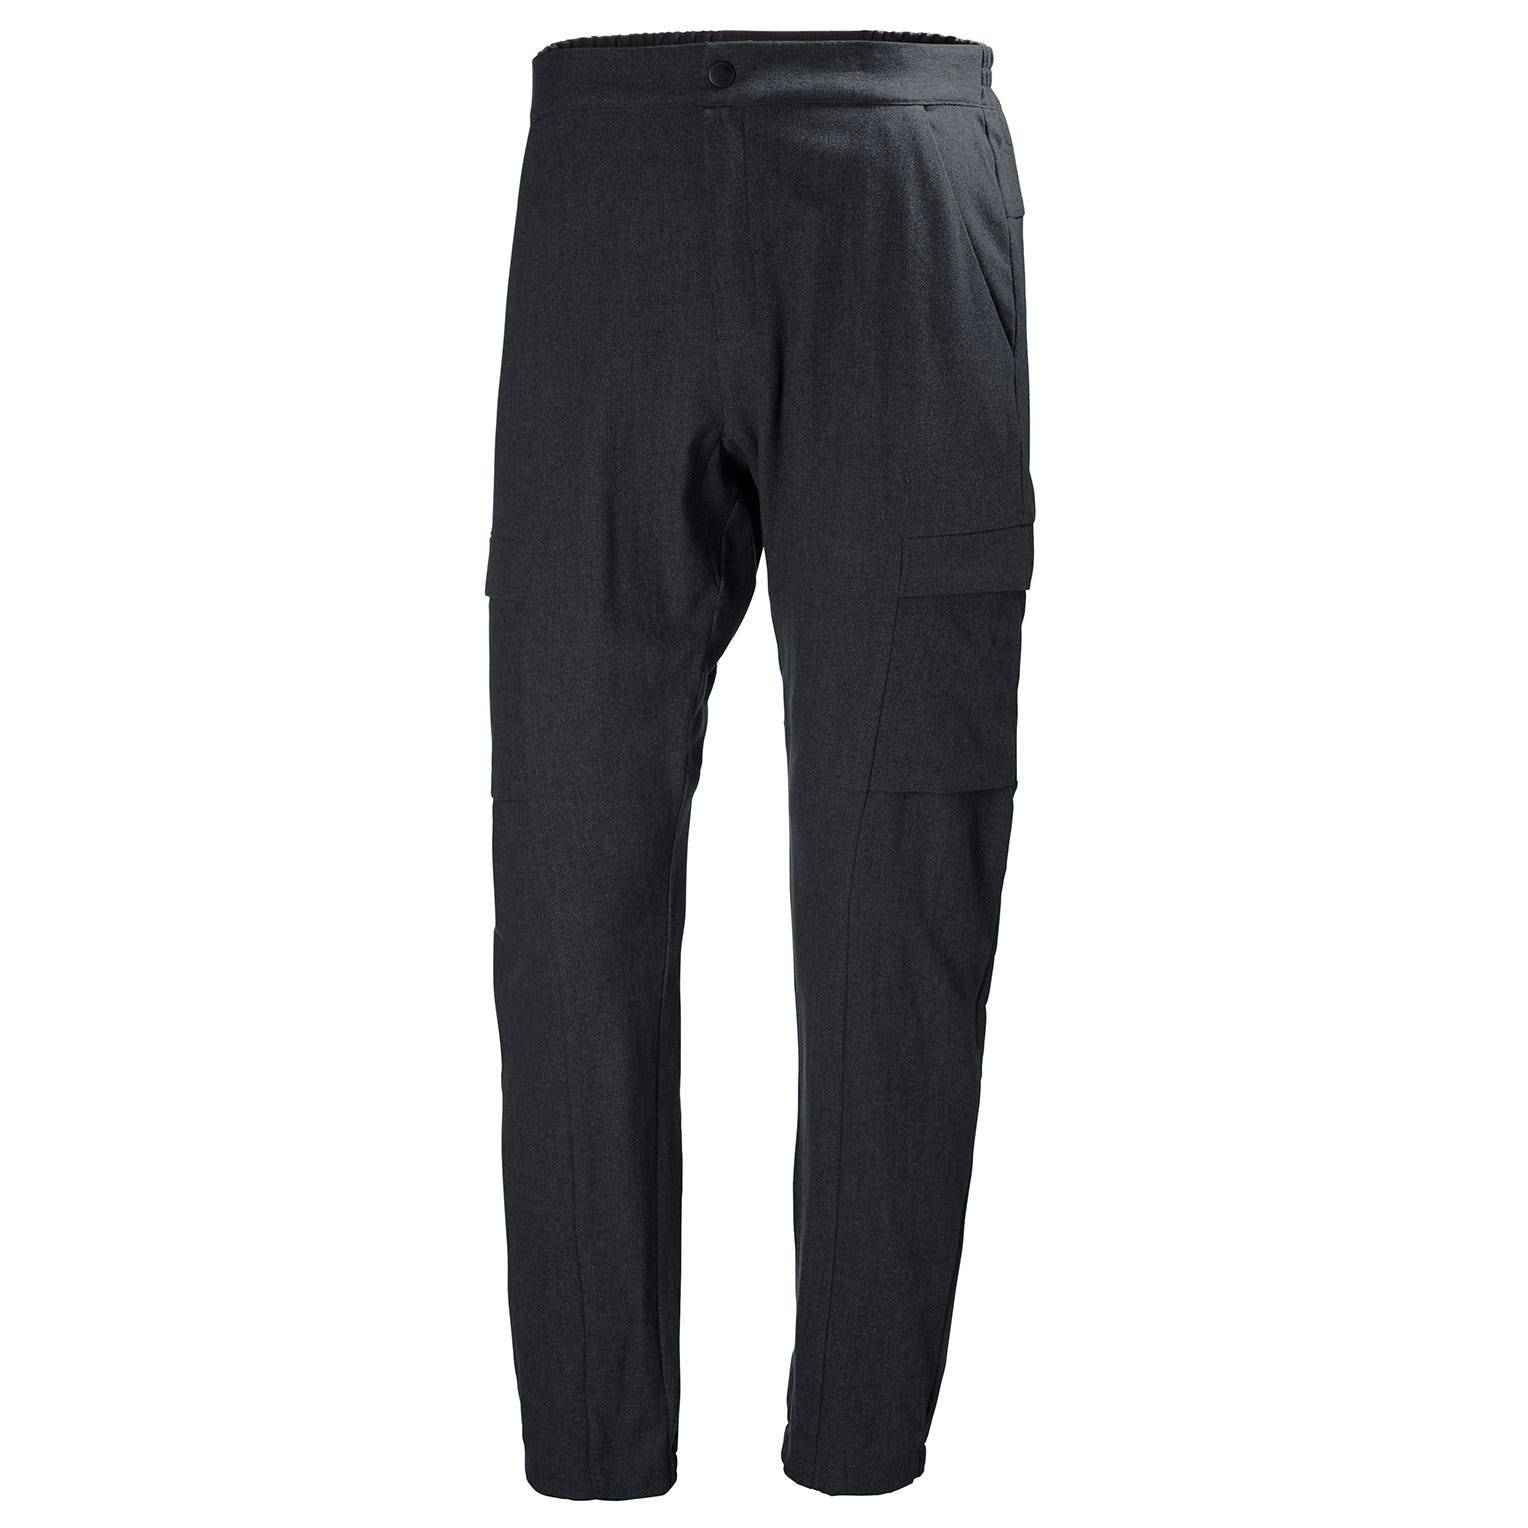 Helly Hansen Wool Travel Hiking Pant Black L